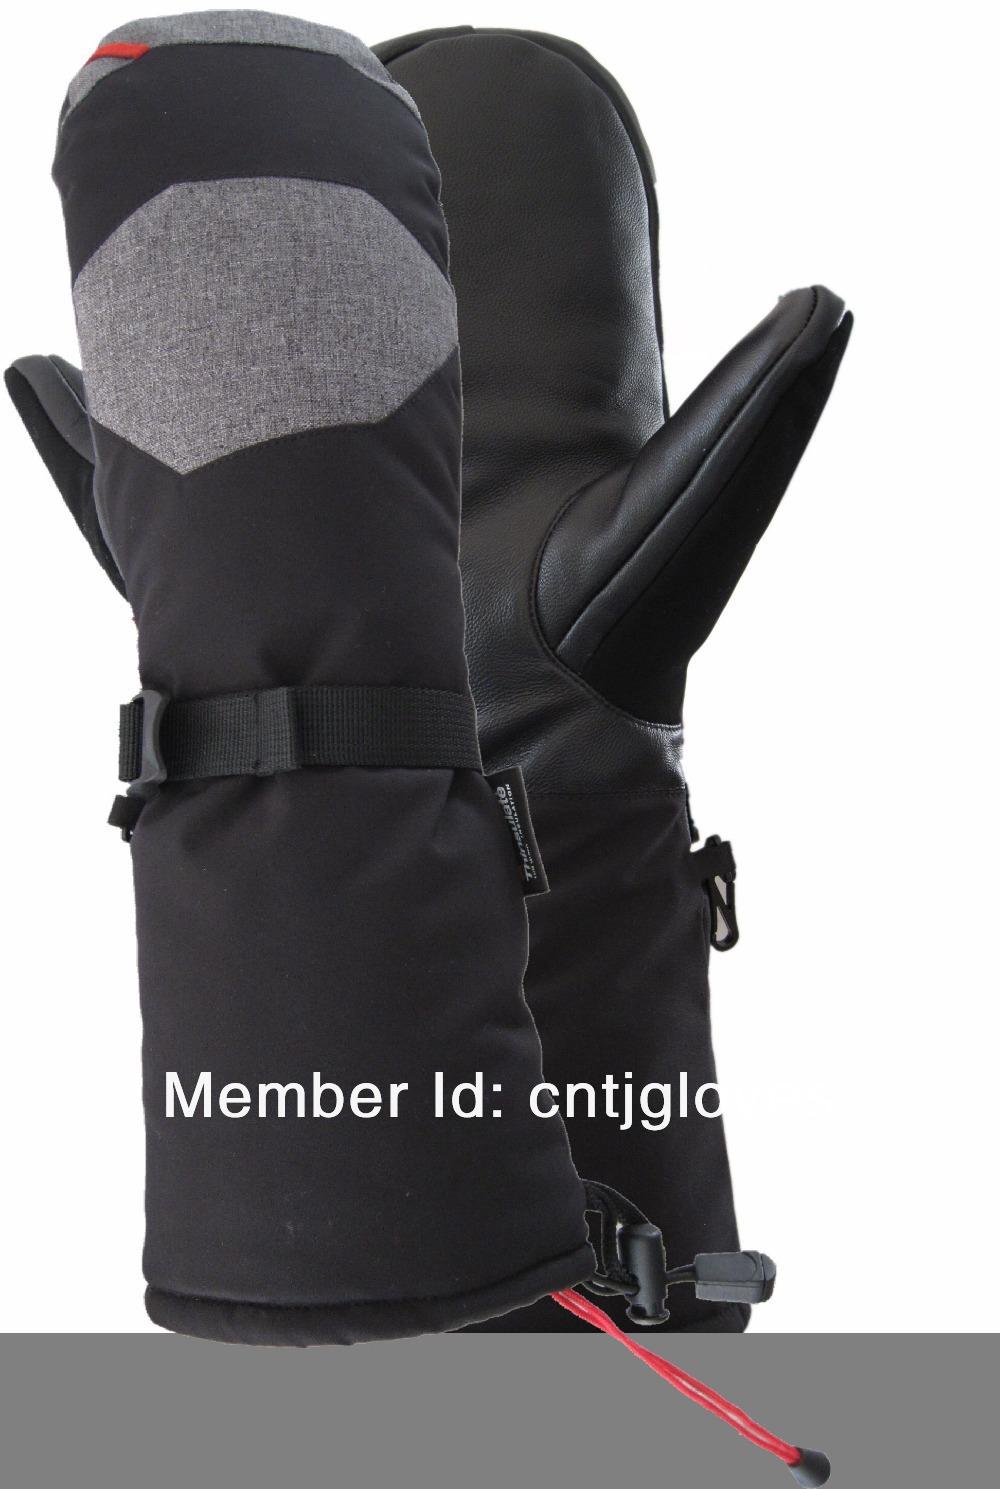 Long Leather Gloves For Men Men's Winter Long Cuff Gloves